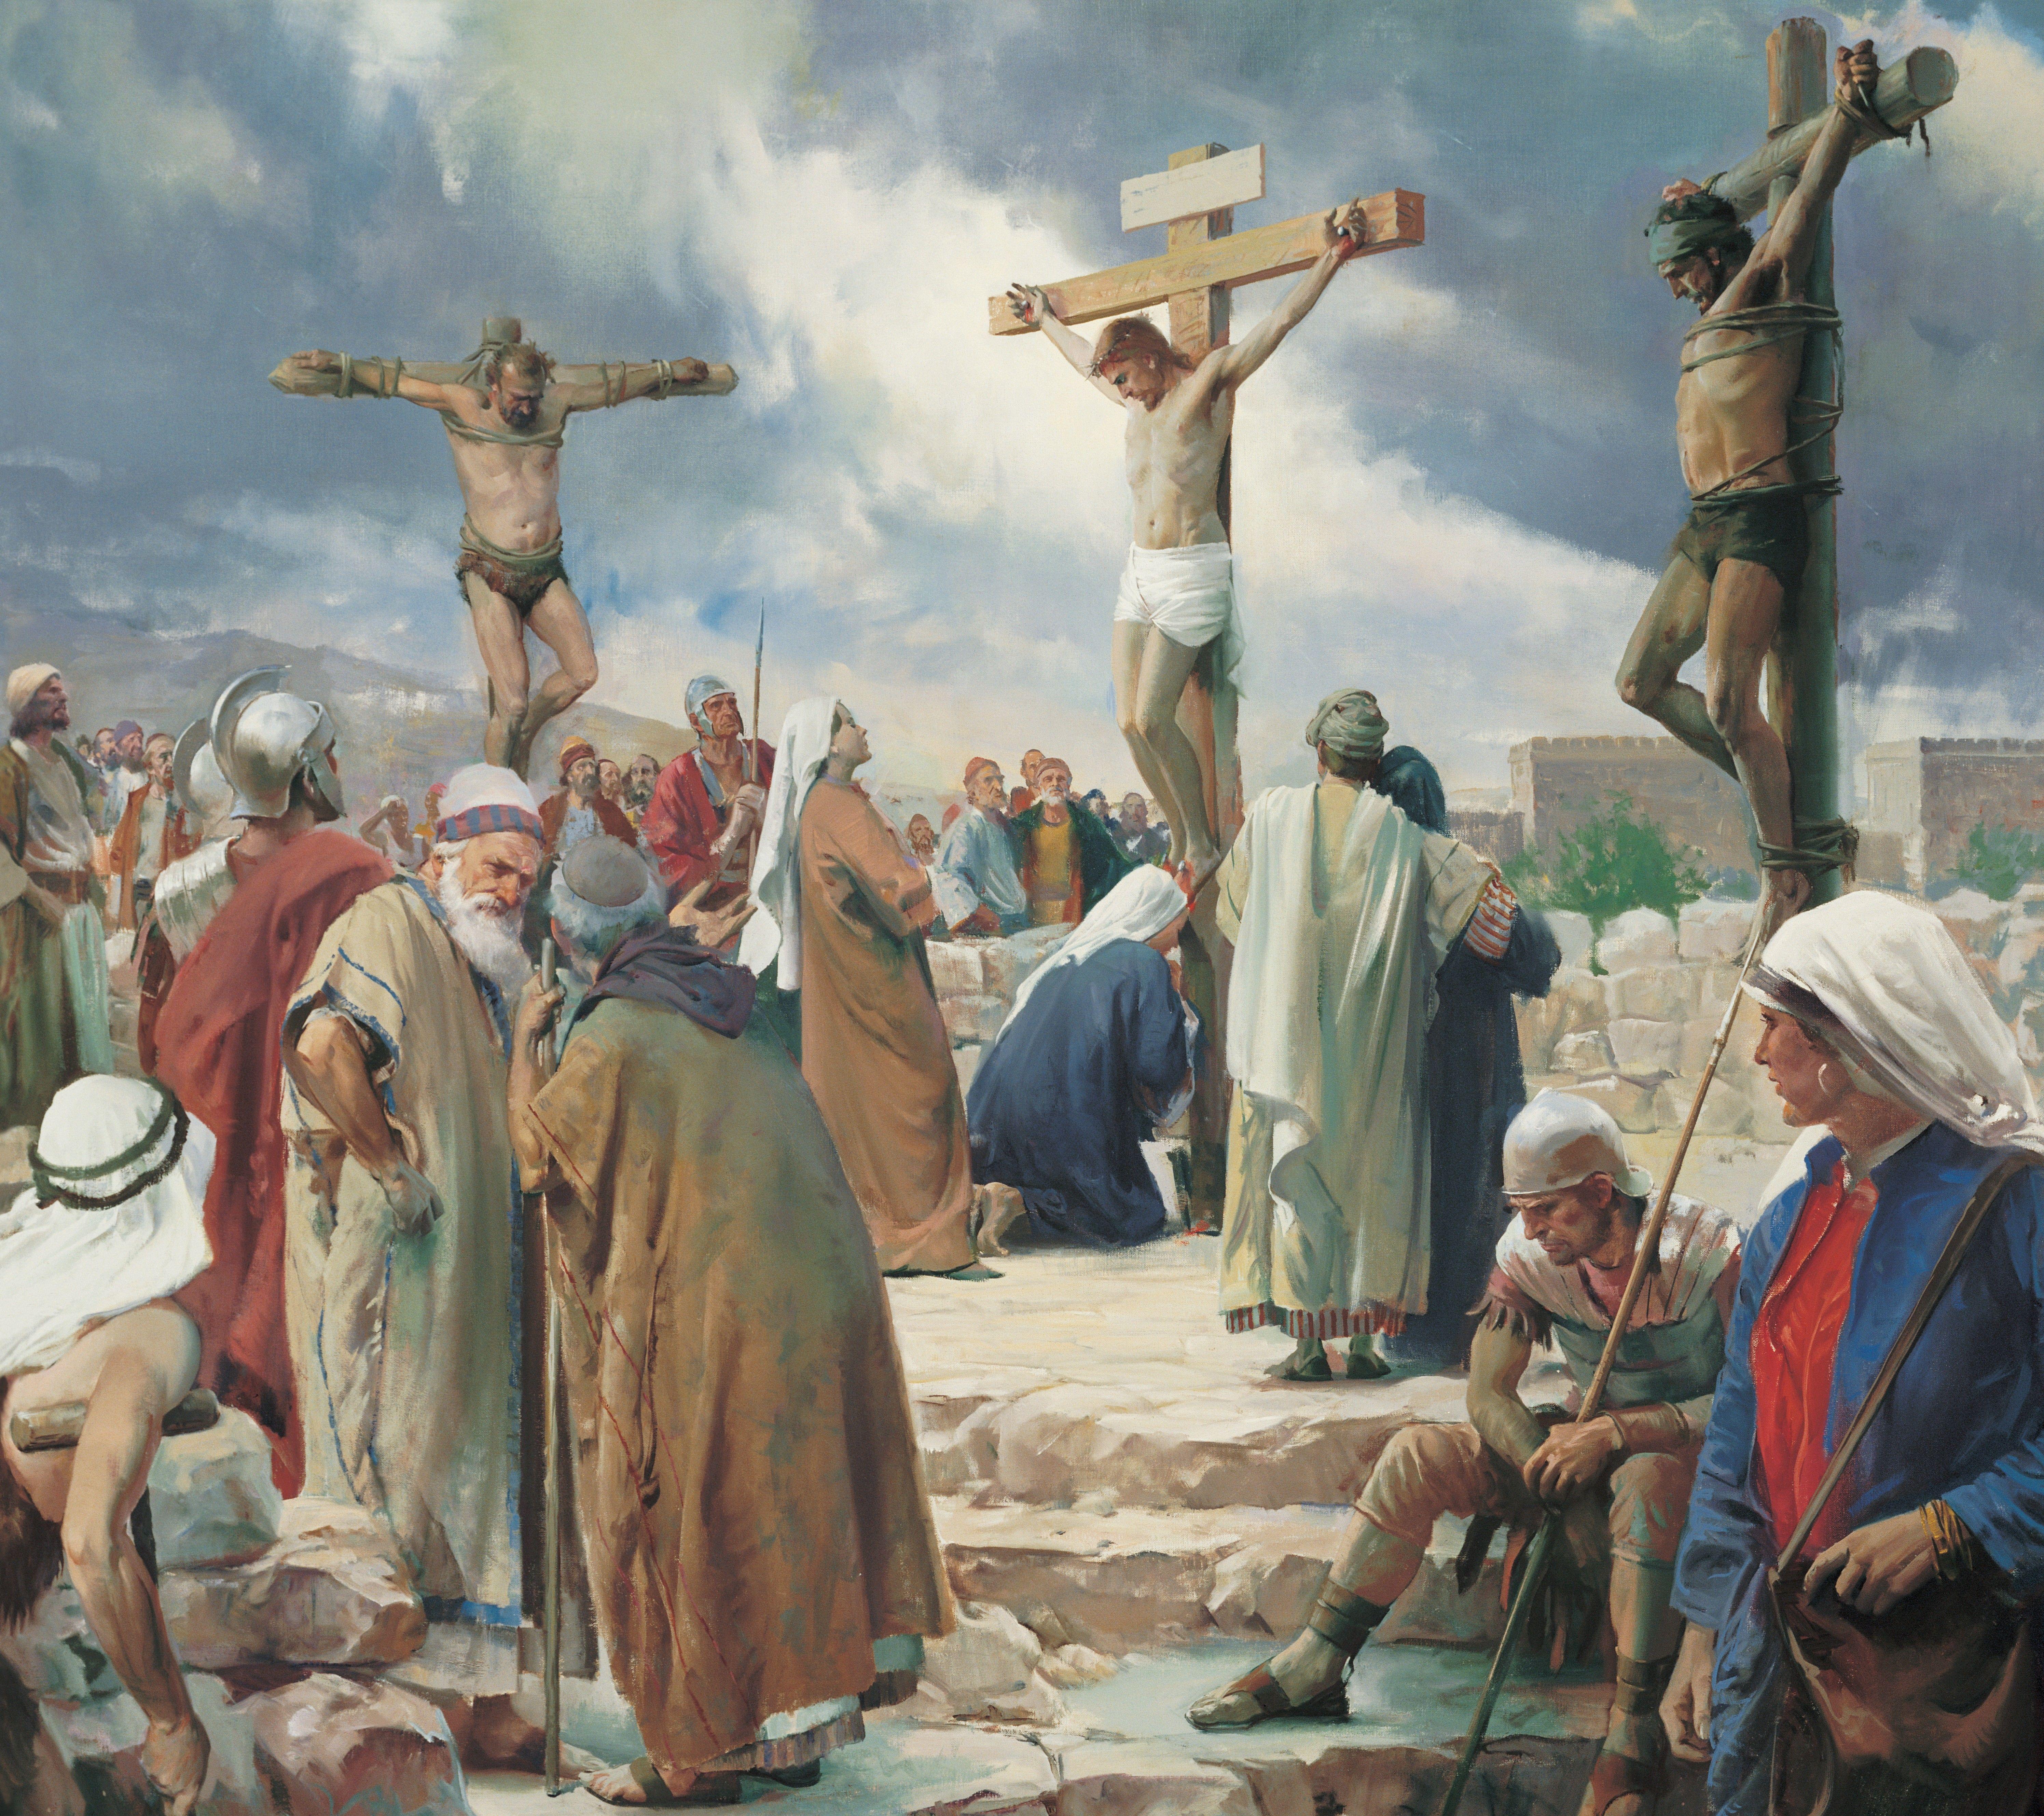 The Crucifixion, by Harry Anderson (62505); GAK 230; GAB 57; Primary manual 1-59; Primary manual 2-61; Primary manual 3-71; Primary manual 4-11; Primary manual 6-27; Primary manual 7-33; Psalm 22:16; Matthew 27:31–50; Mark 15:20–37; Luke 23:33–46; John 19:16–37; 1 Nephi 19:10; 2 Nephi 5; 6:9; 10:3; 25:13; Mosiah 3:9; 15:7